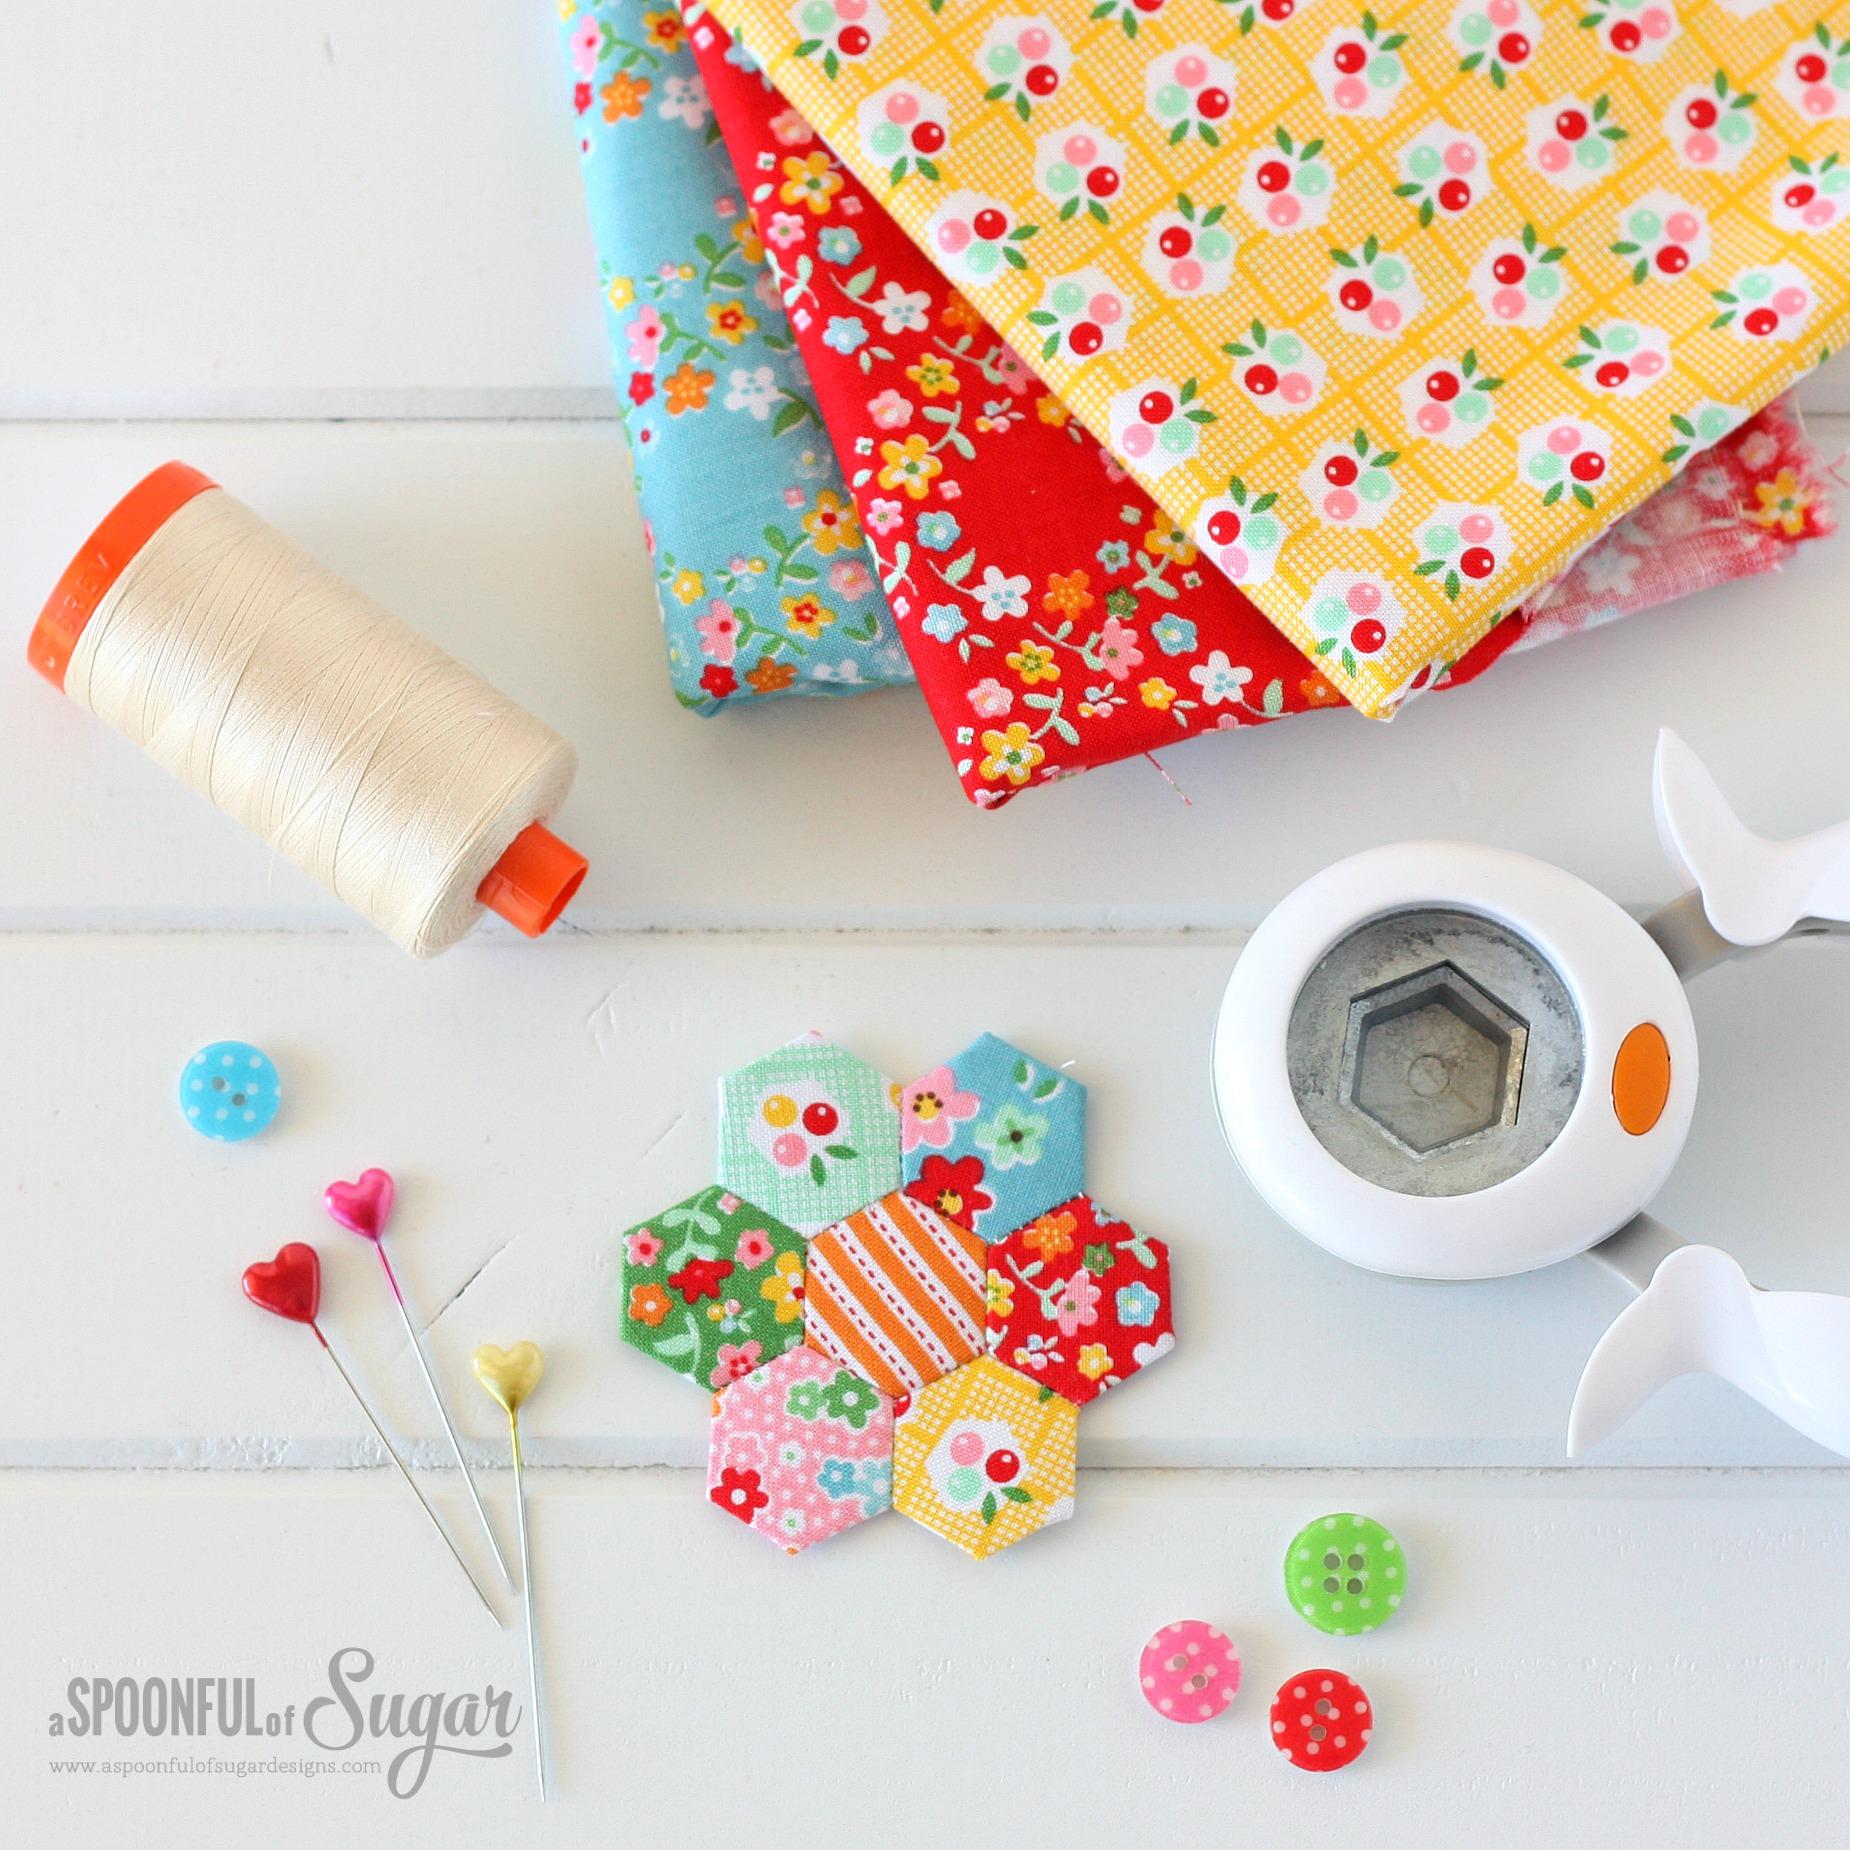 Hexie Pincushion {Free Sewing Tutorial} - A Spoonful of Sugar